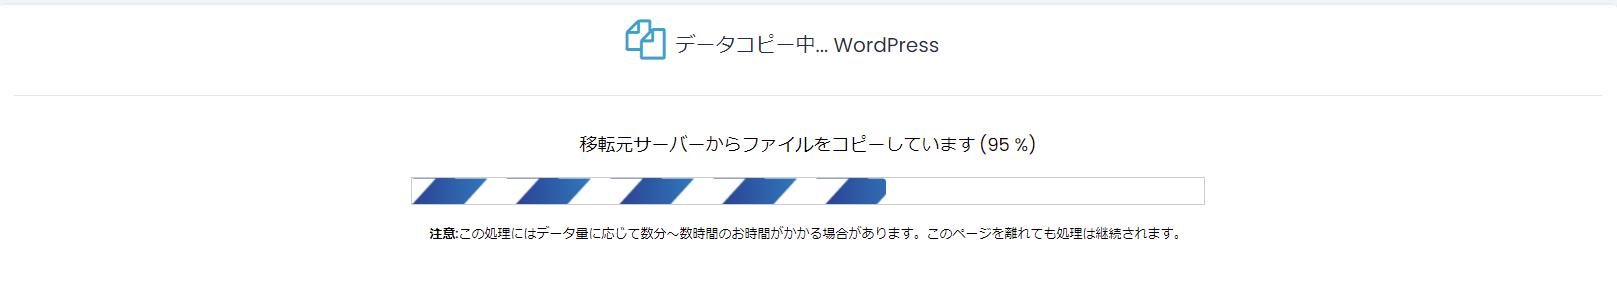 WordPressかんたん引越し機能データ3